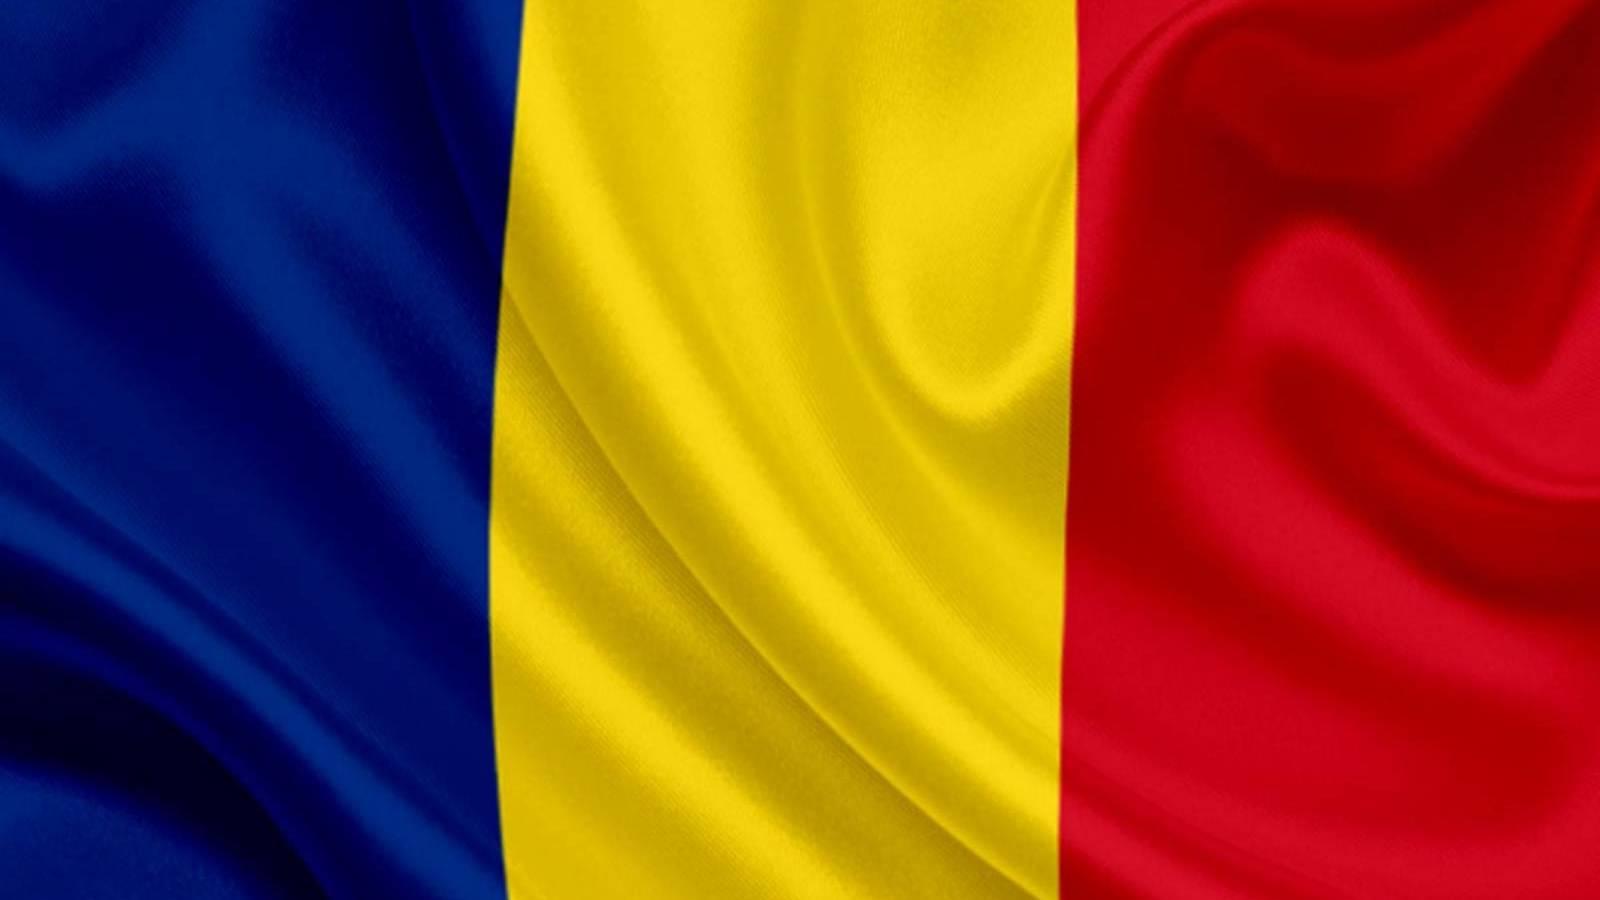 Romania Situatia Cazurilor Noi SARS-CoV-2 Judete 1 Septembrie 2021